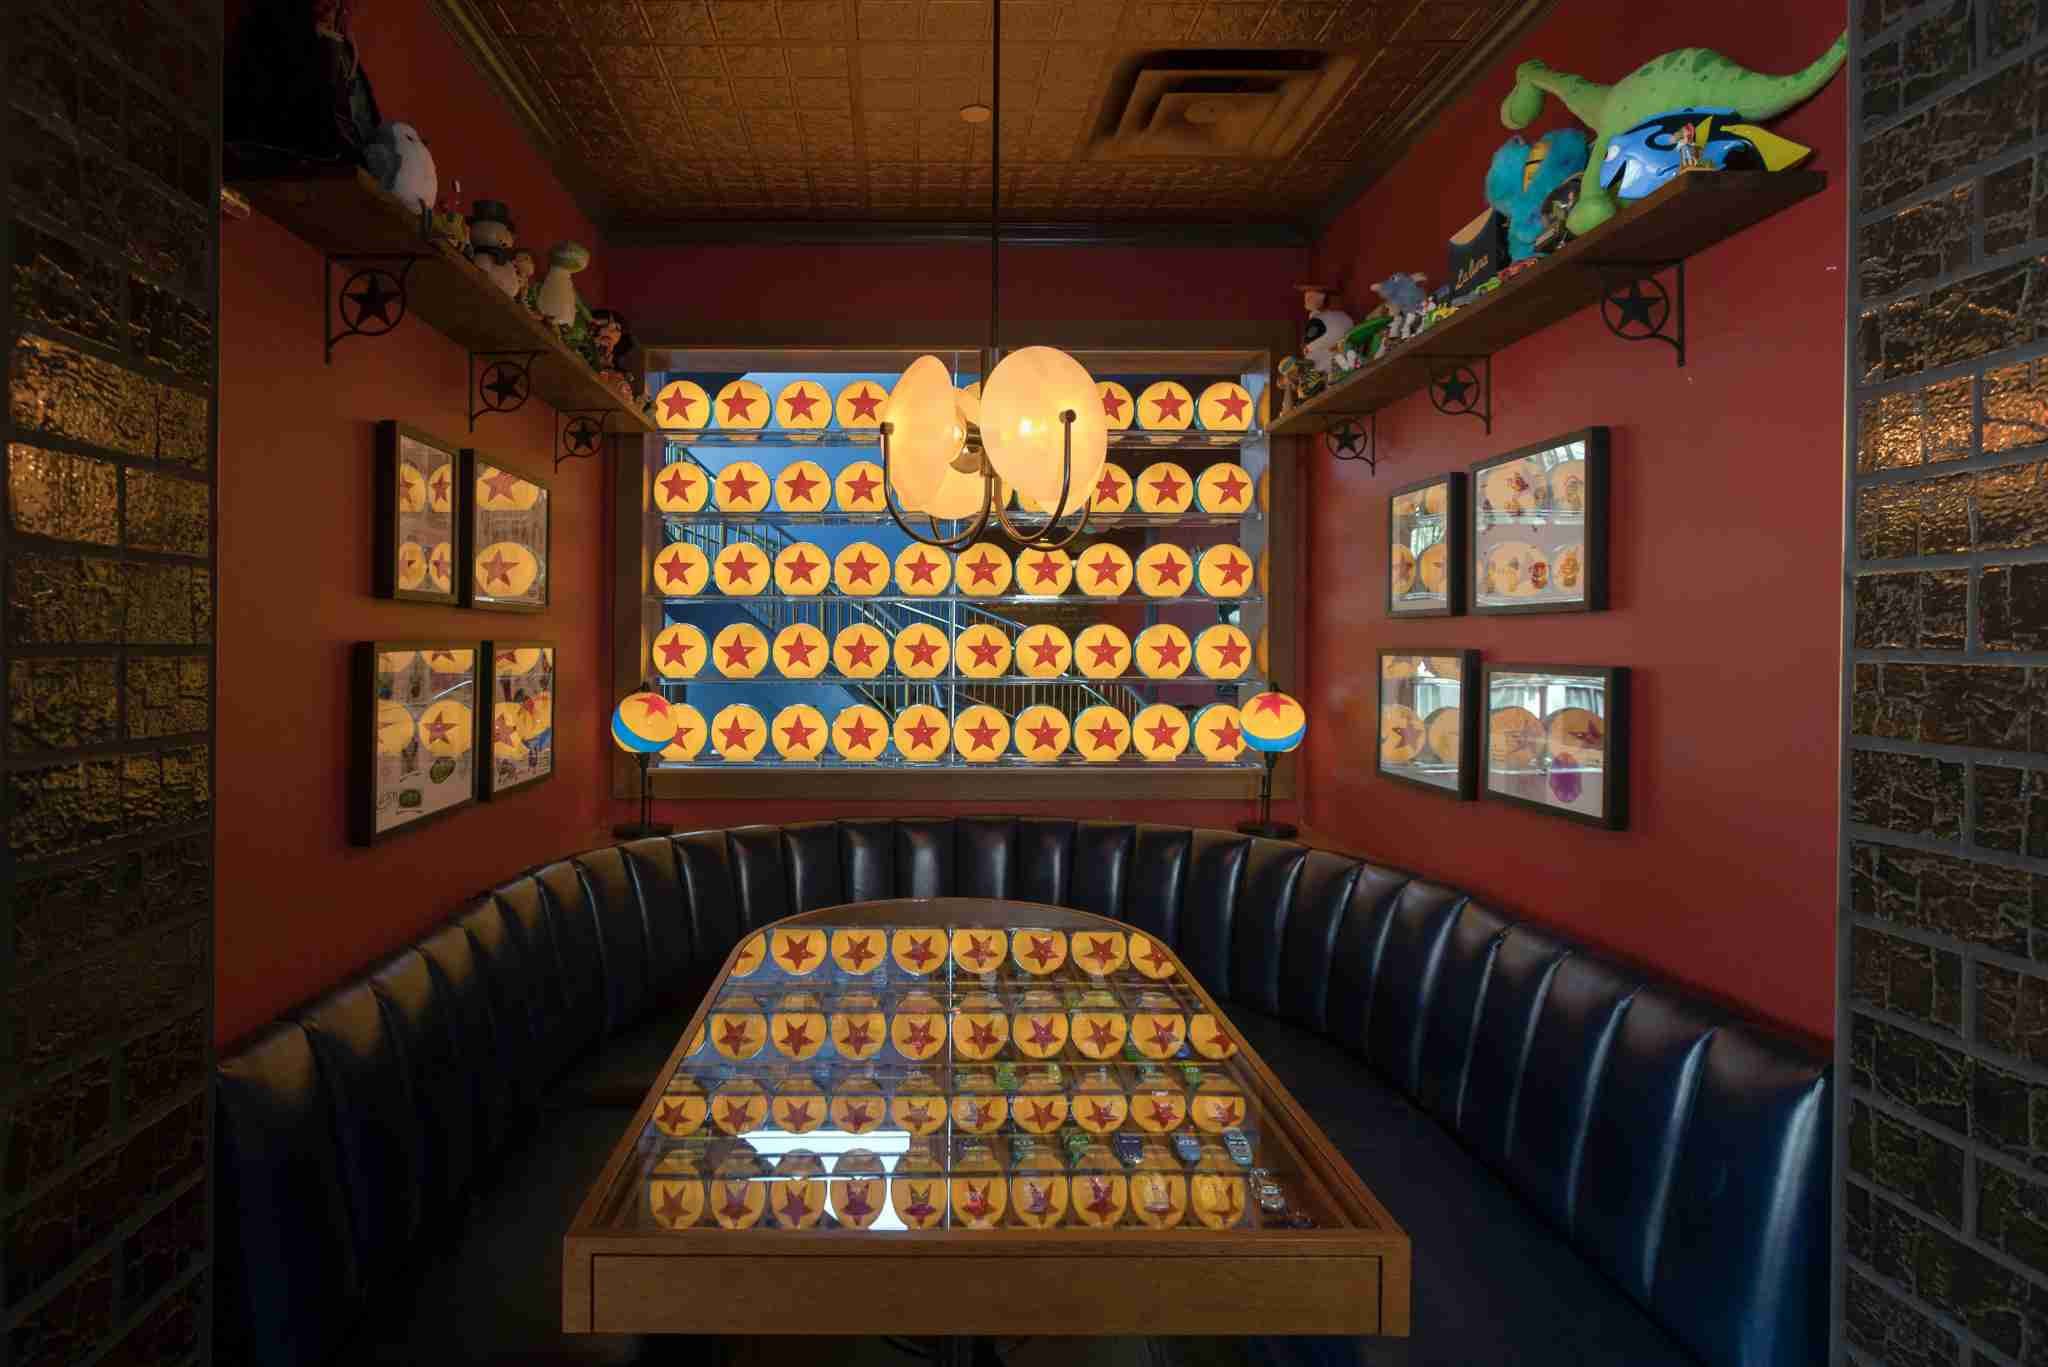 Best Disneyland Restaurants - Lamplight Lounge